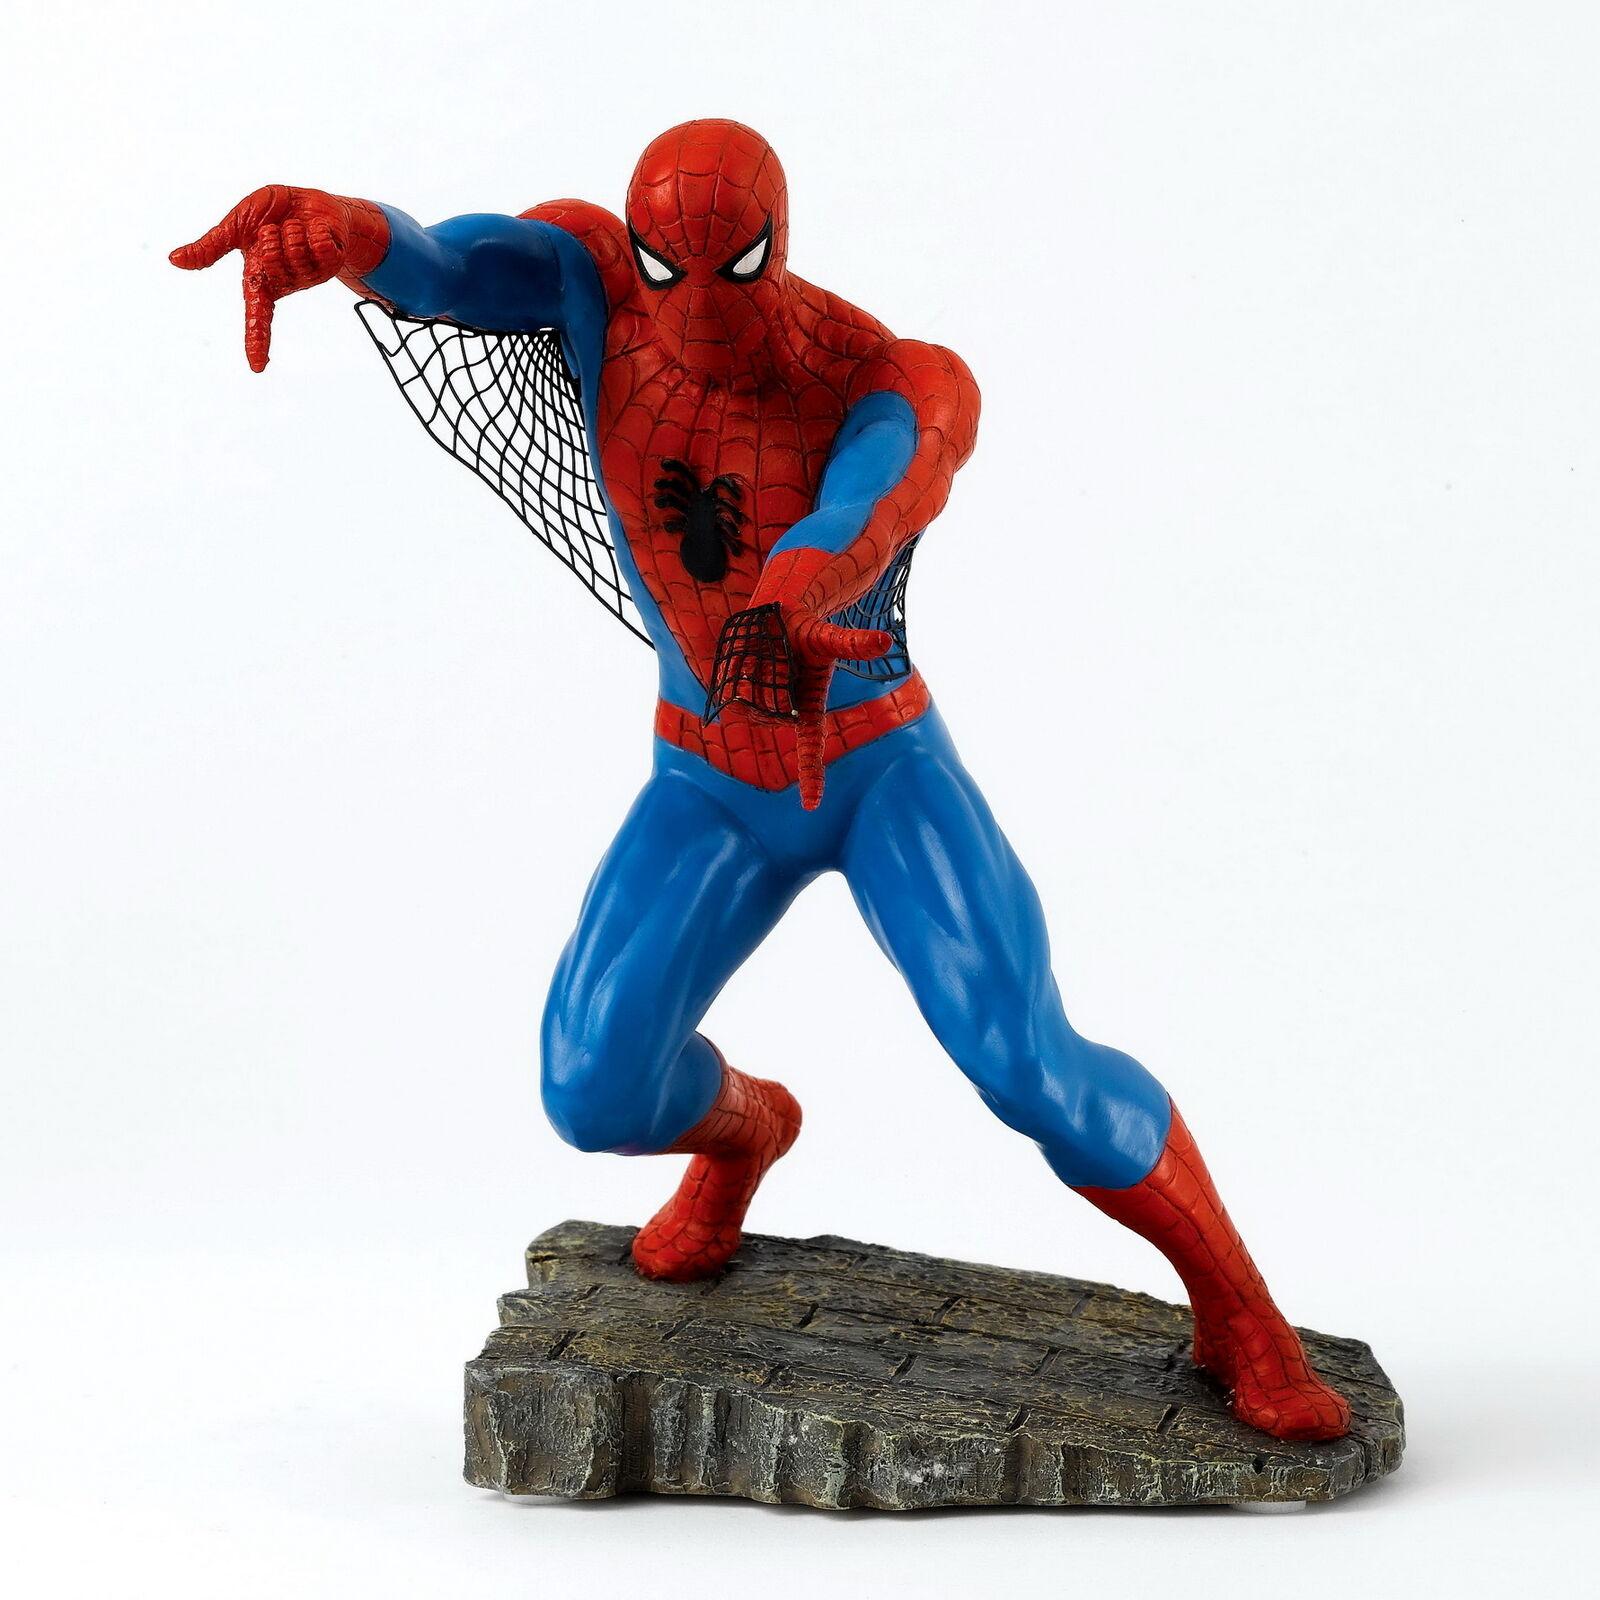 MARVEL Enesco Super Héros Figurine d'action   SPIDER MAN   a27599 - 14 x 14.5 18